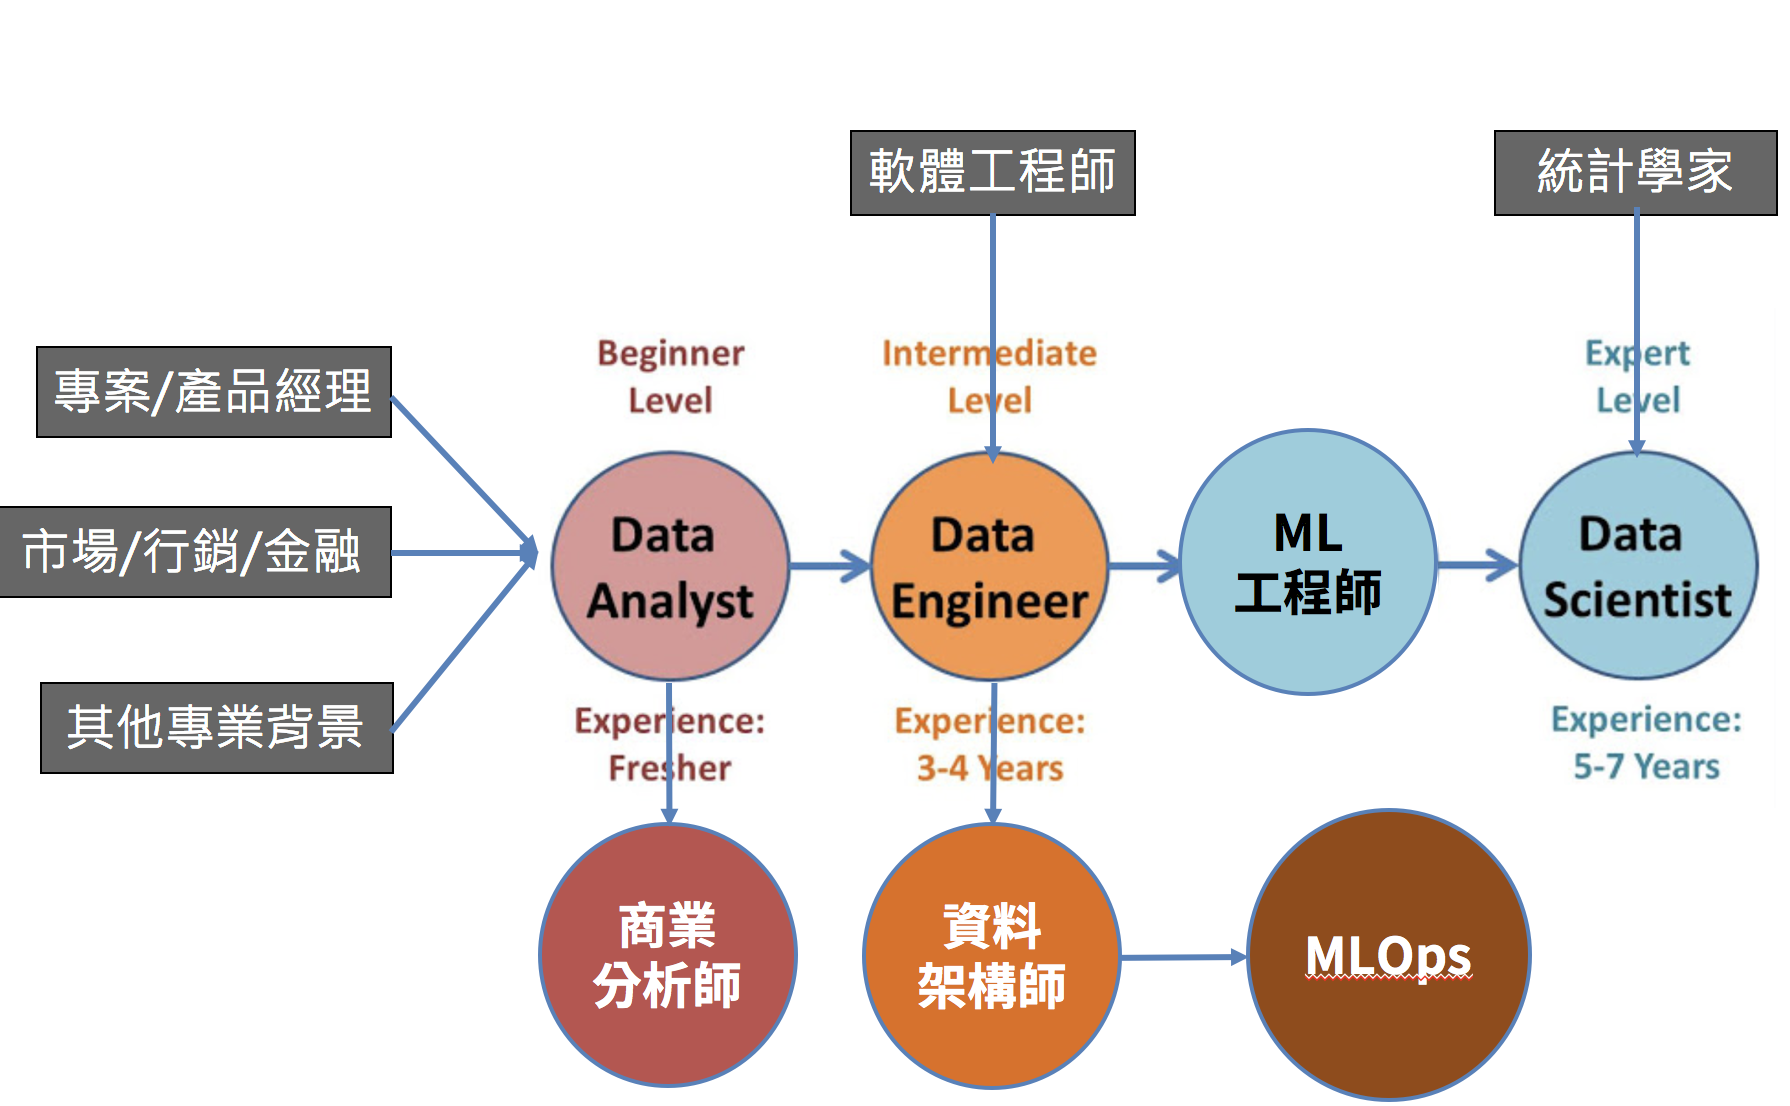 http://educlasses.co.in/data-scientist-vs-data-engineer-vs-data-analyst-comparison.html